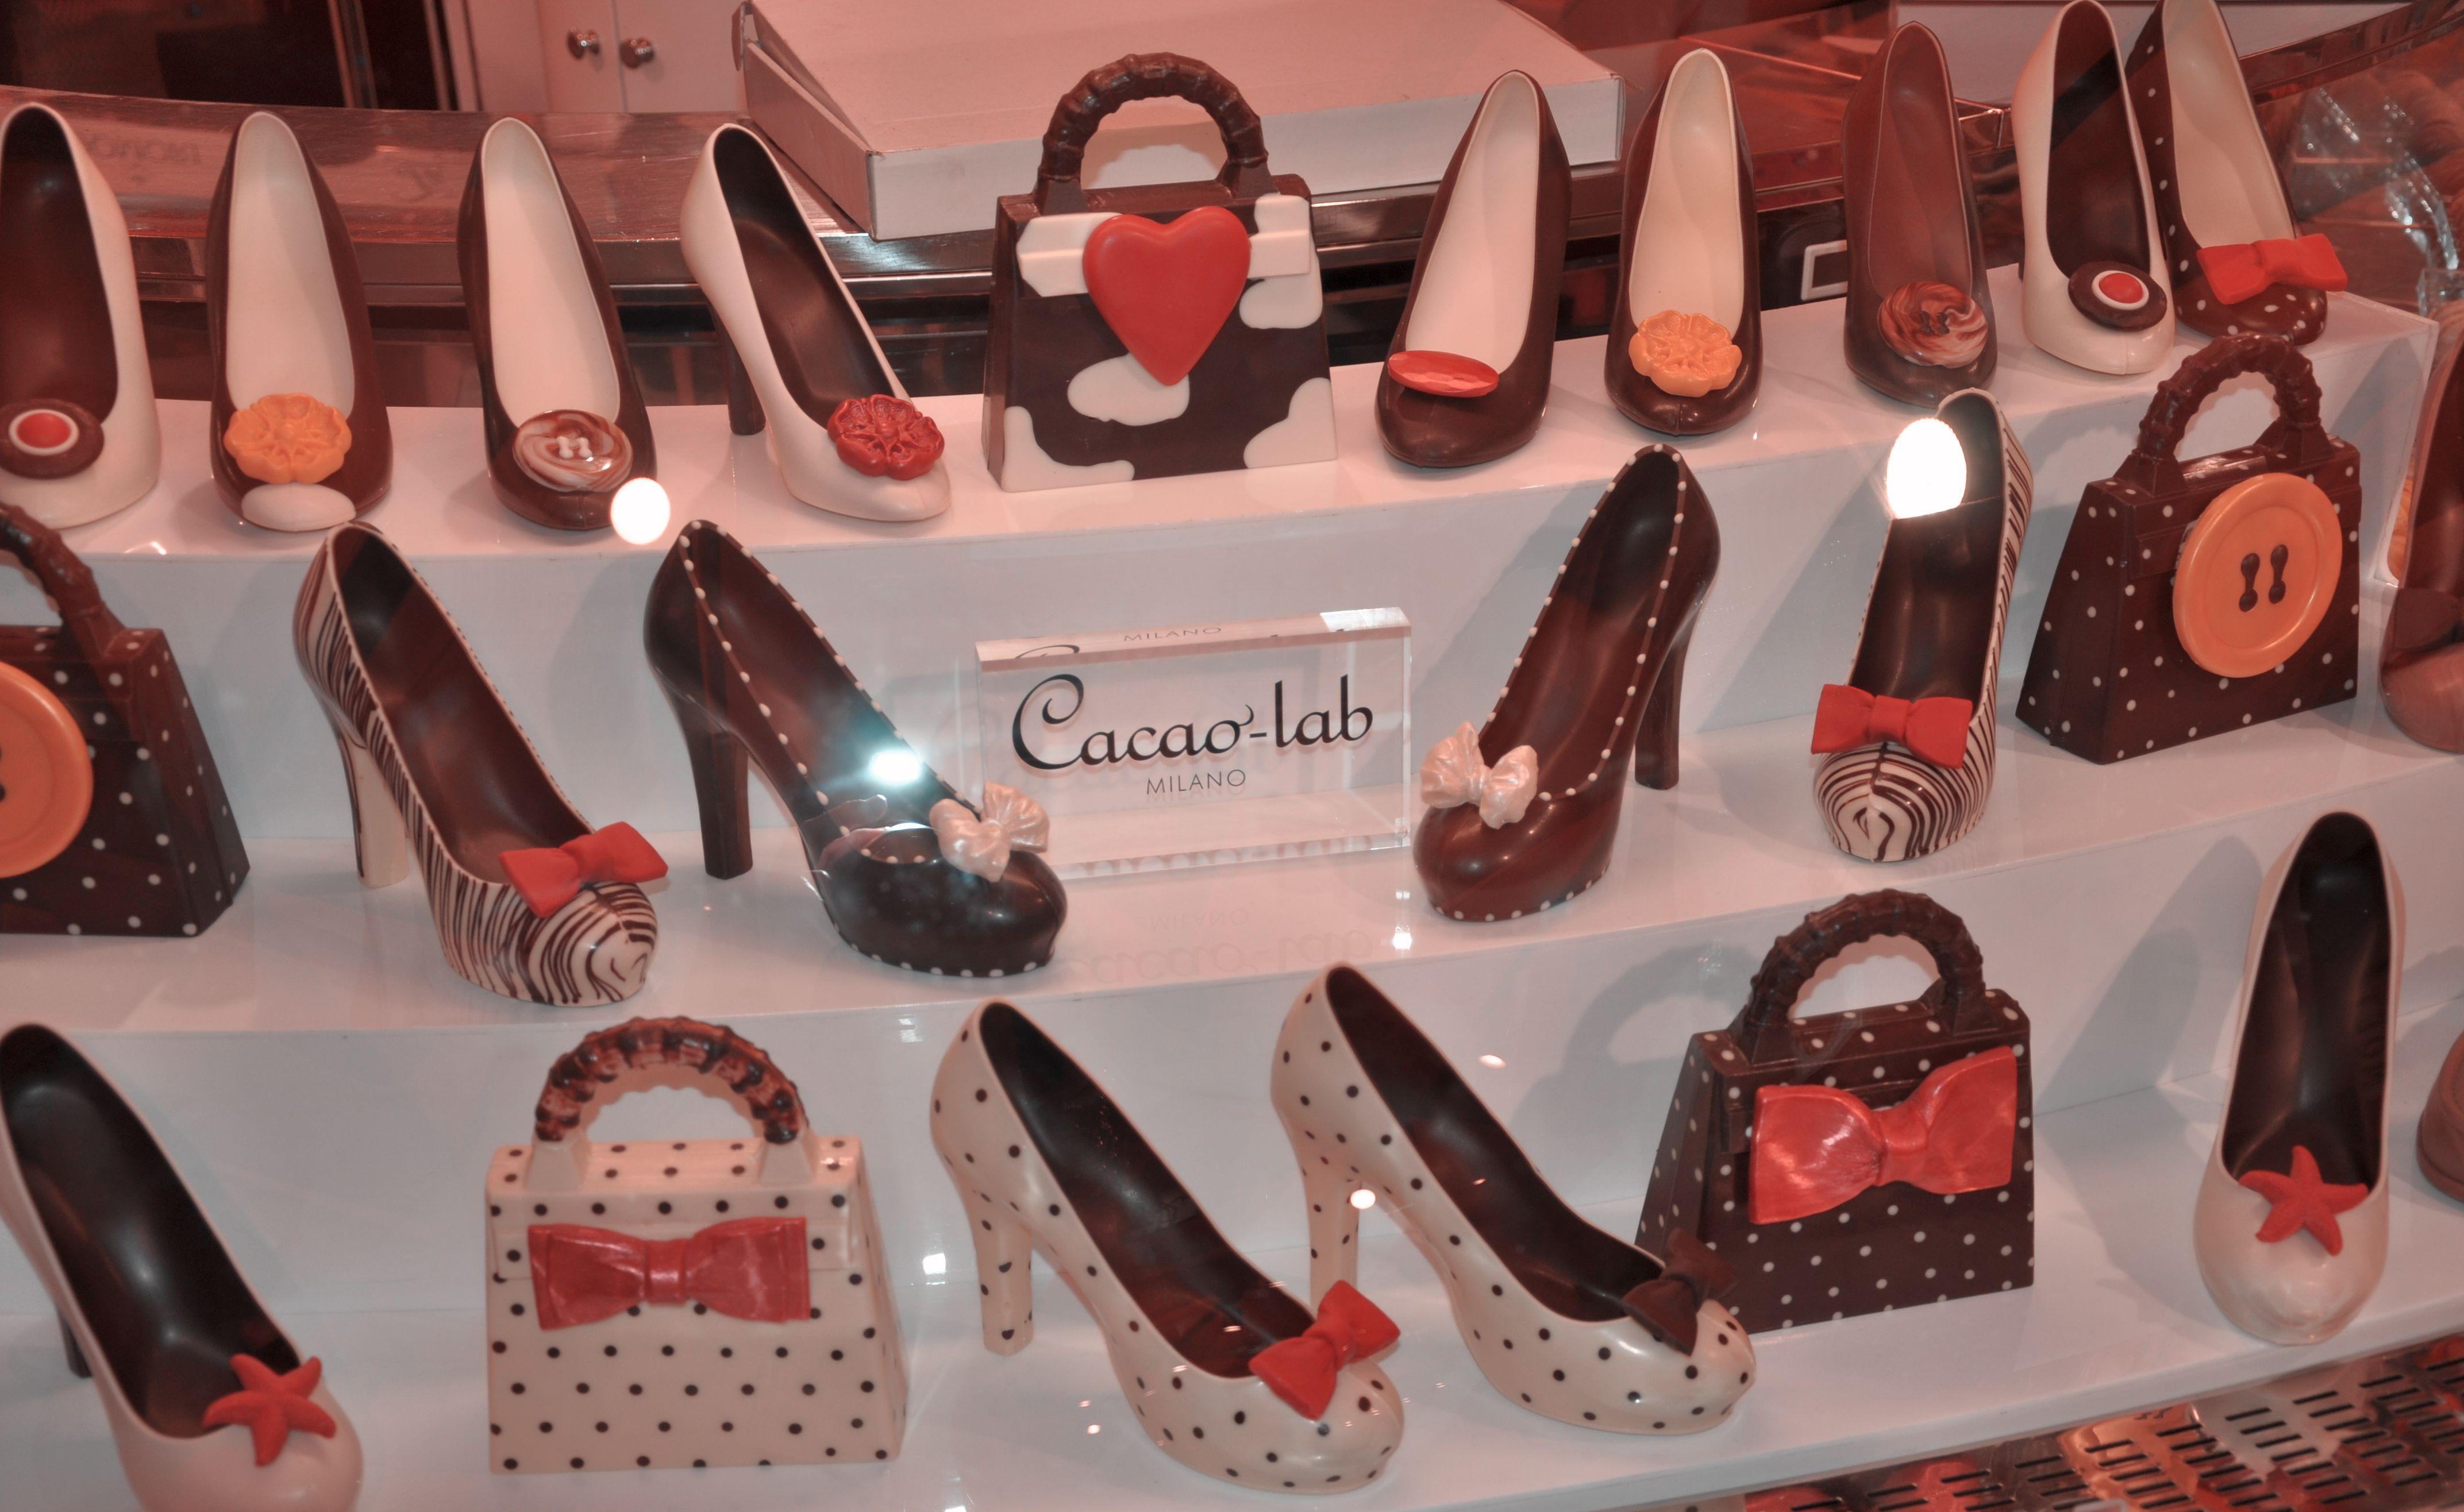 Schokoladen Hells, Pumps Mailand